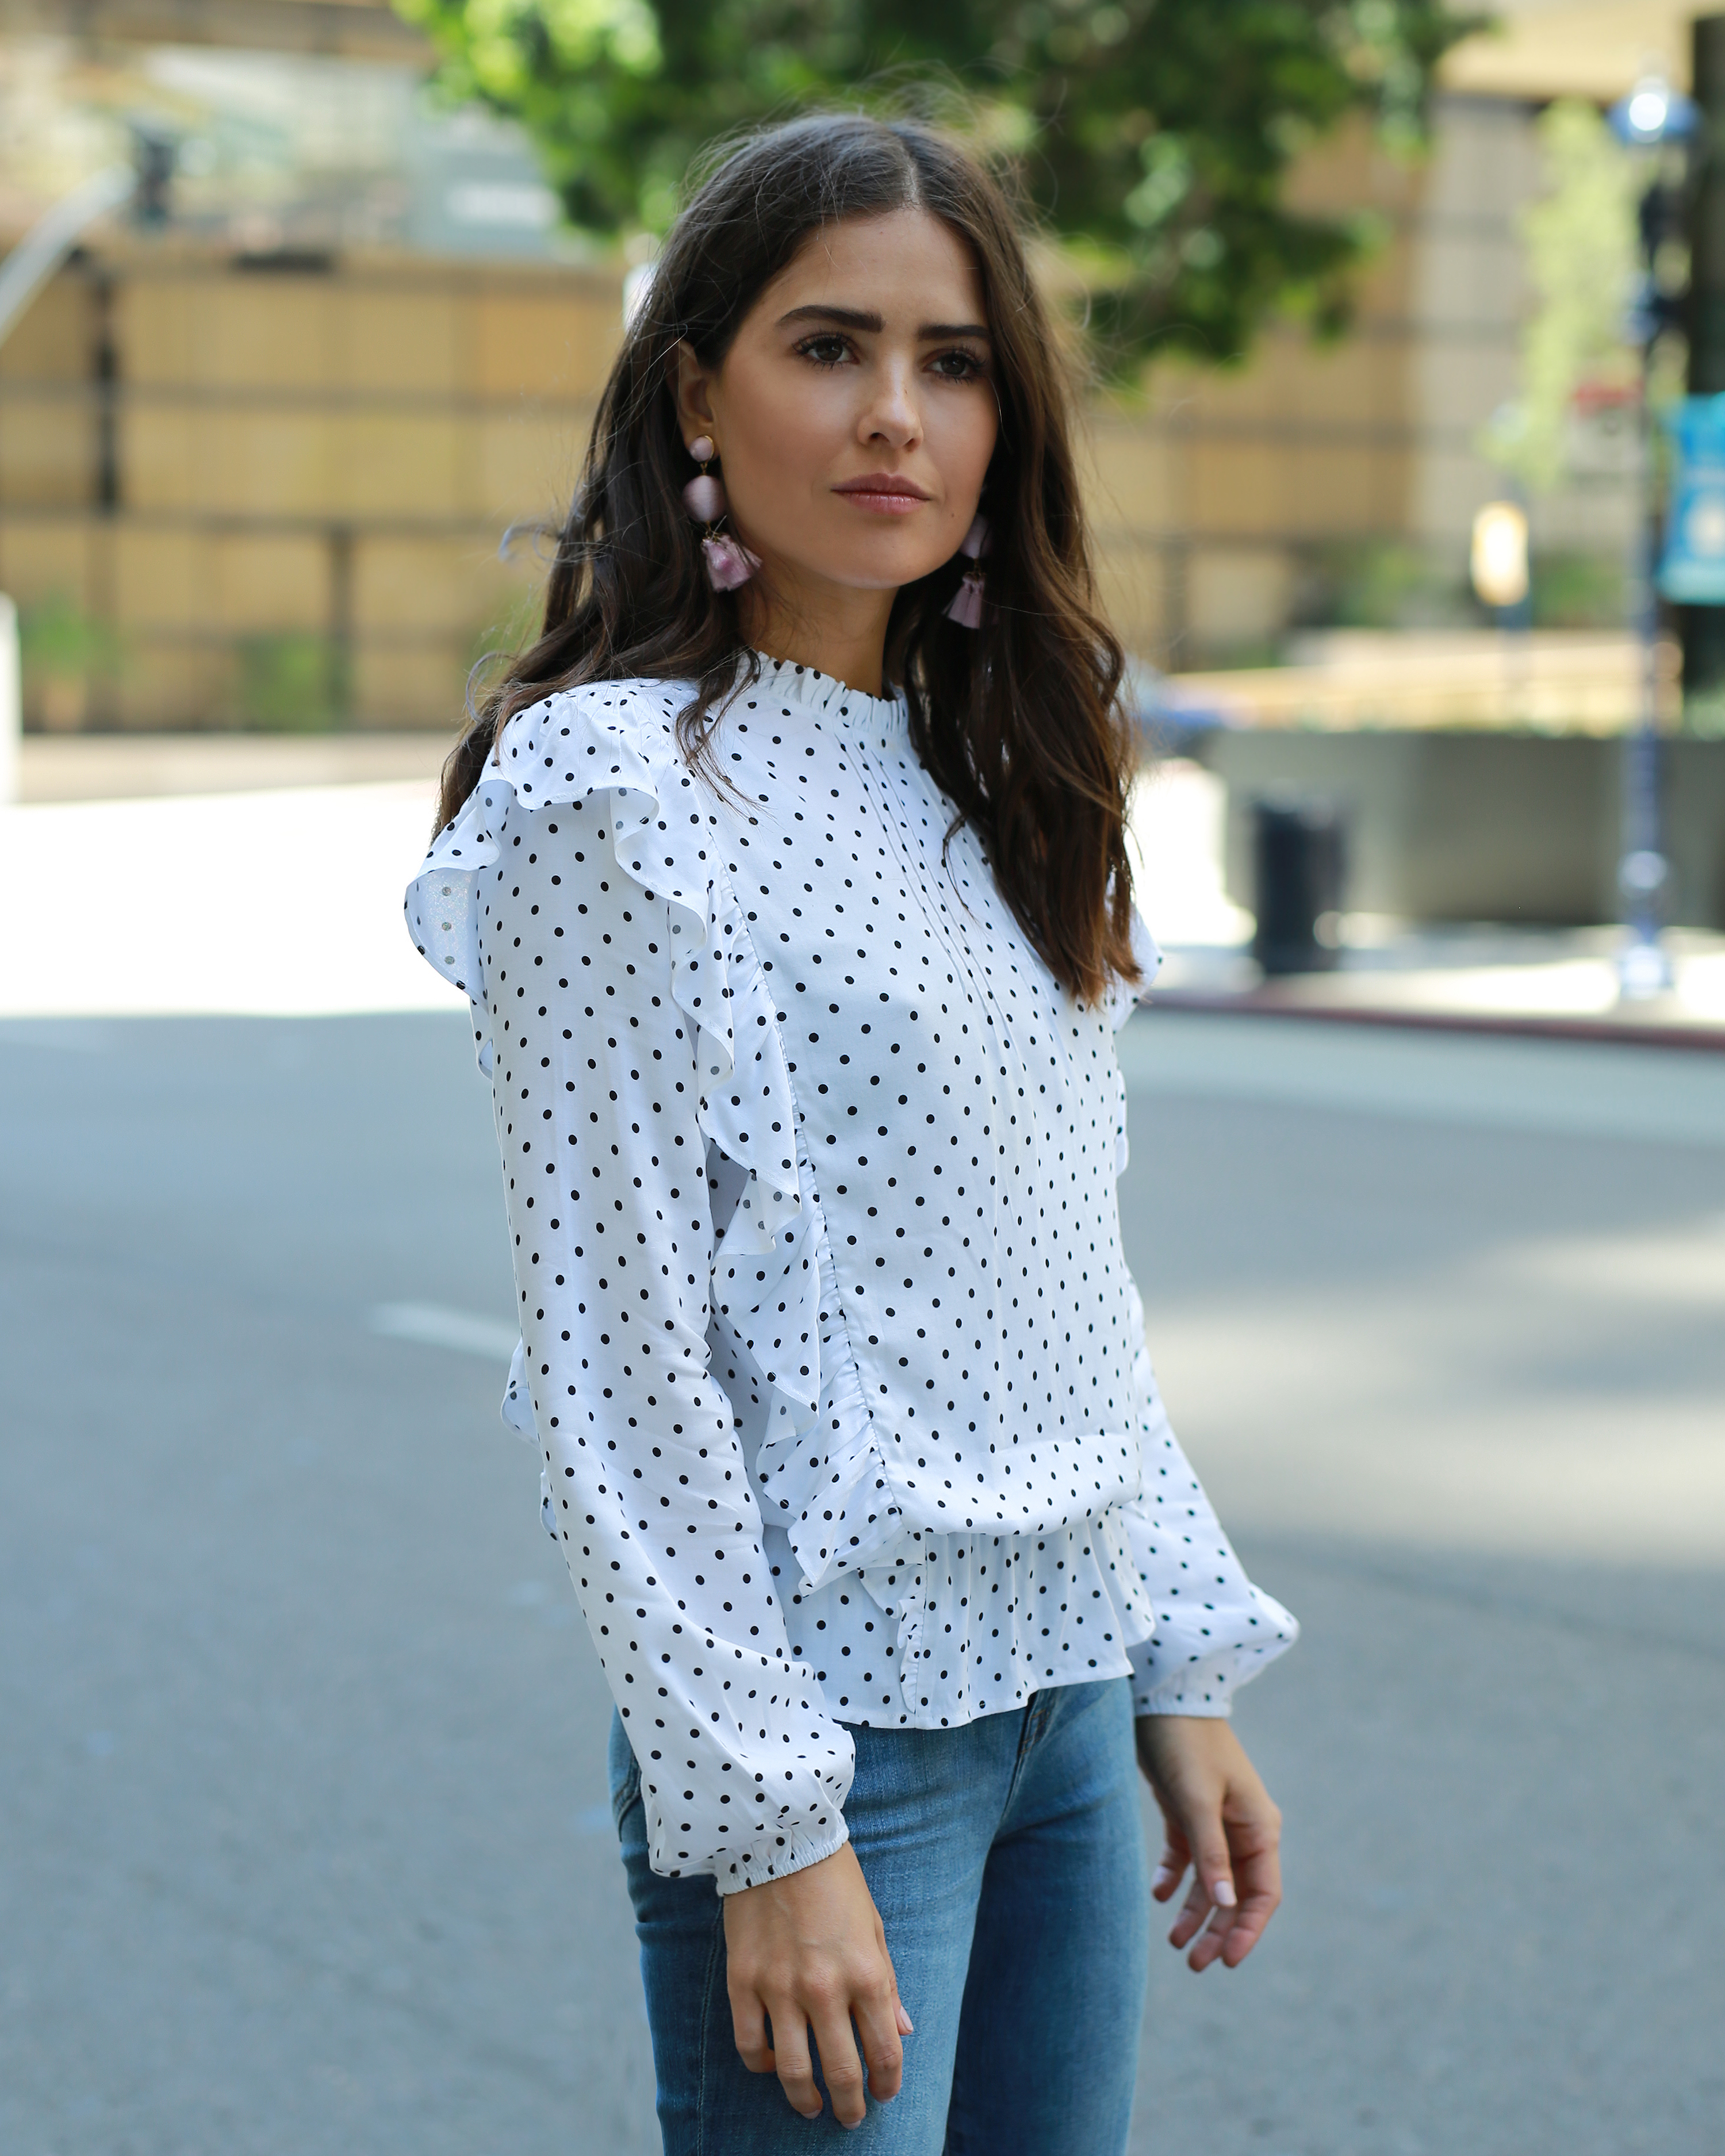 The Drop par Amazon Fashion lance sa première collection avec l'influenceuse Paola Alberdi